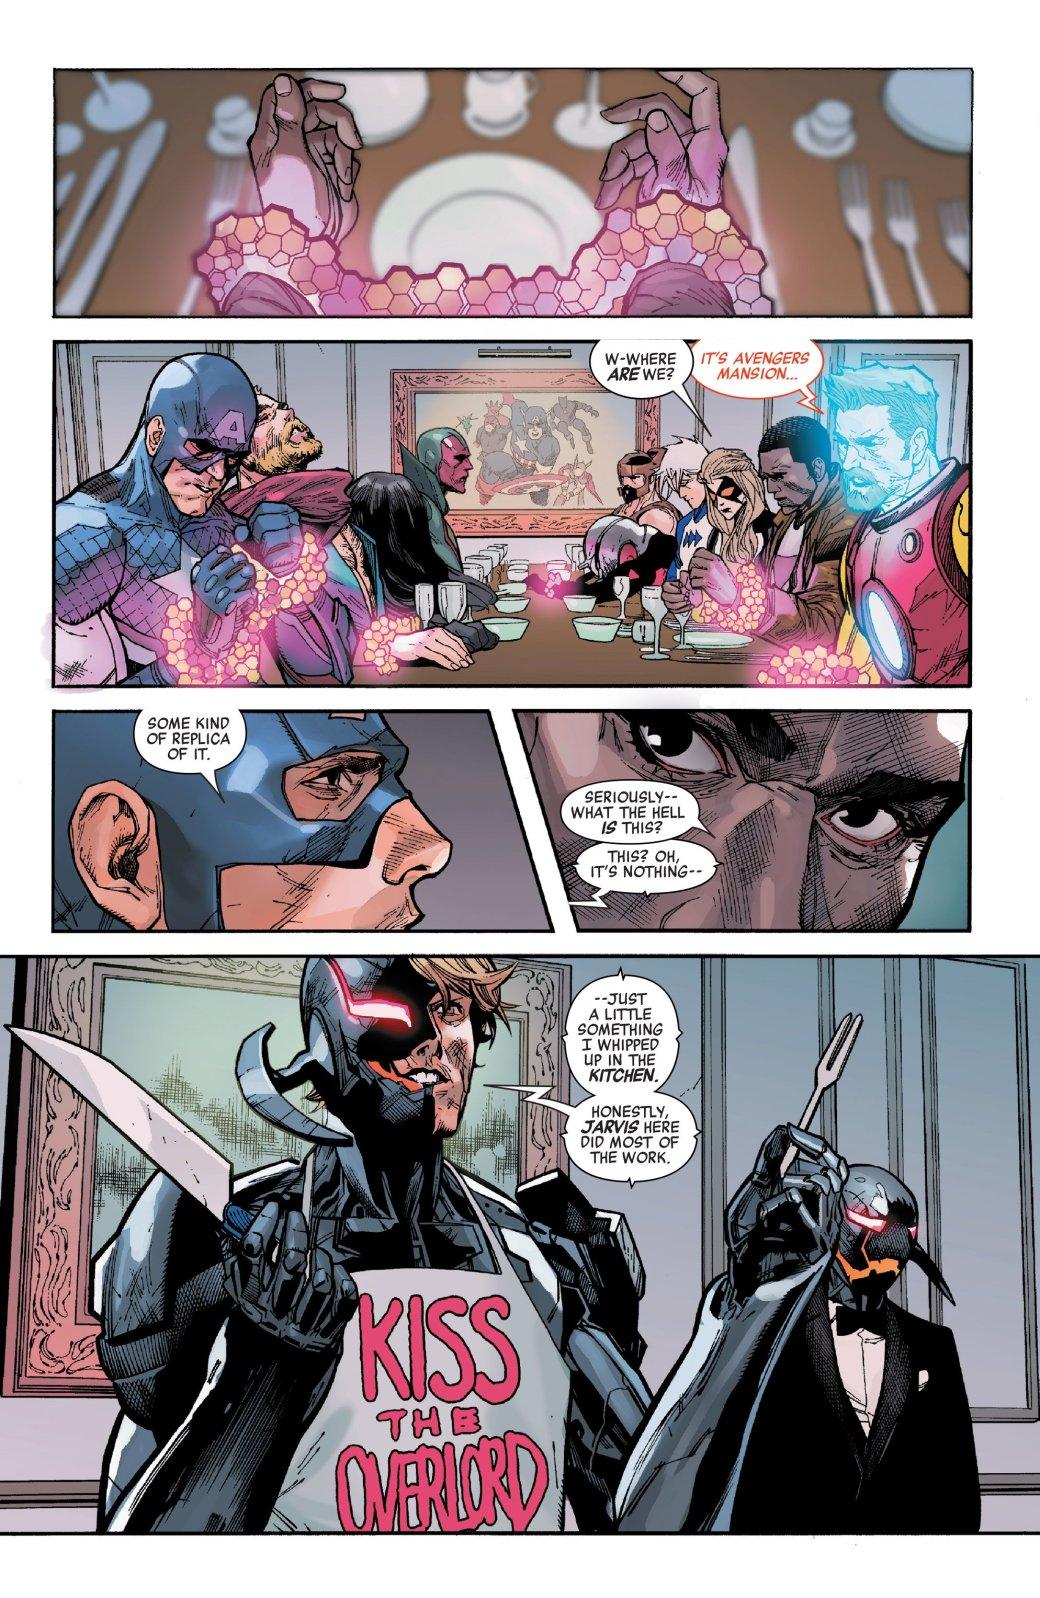 Secret Empire: противостоянию Стива Роджерса иТони Старка нет конца - Изображение 18